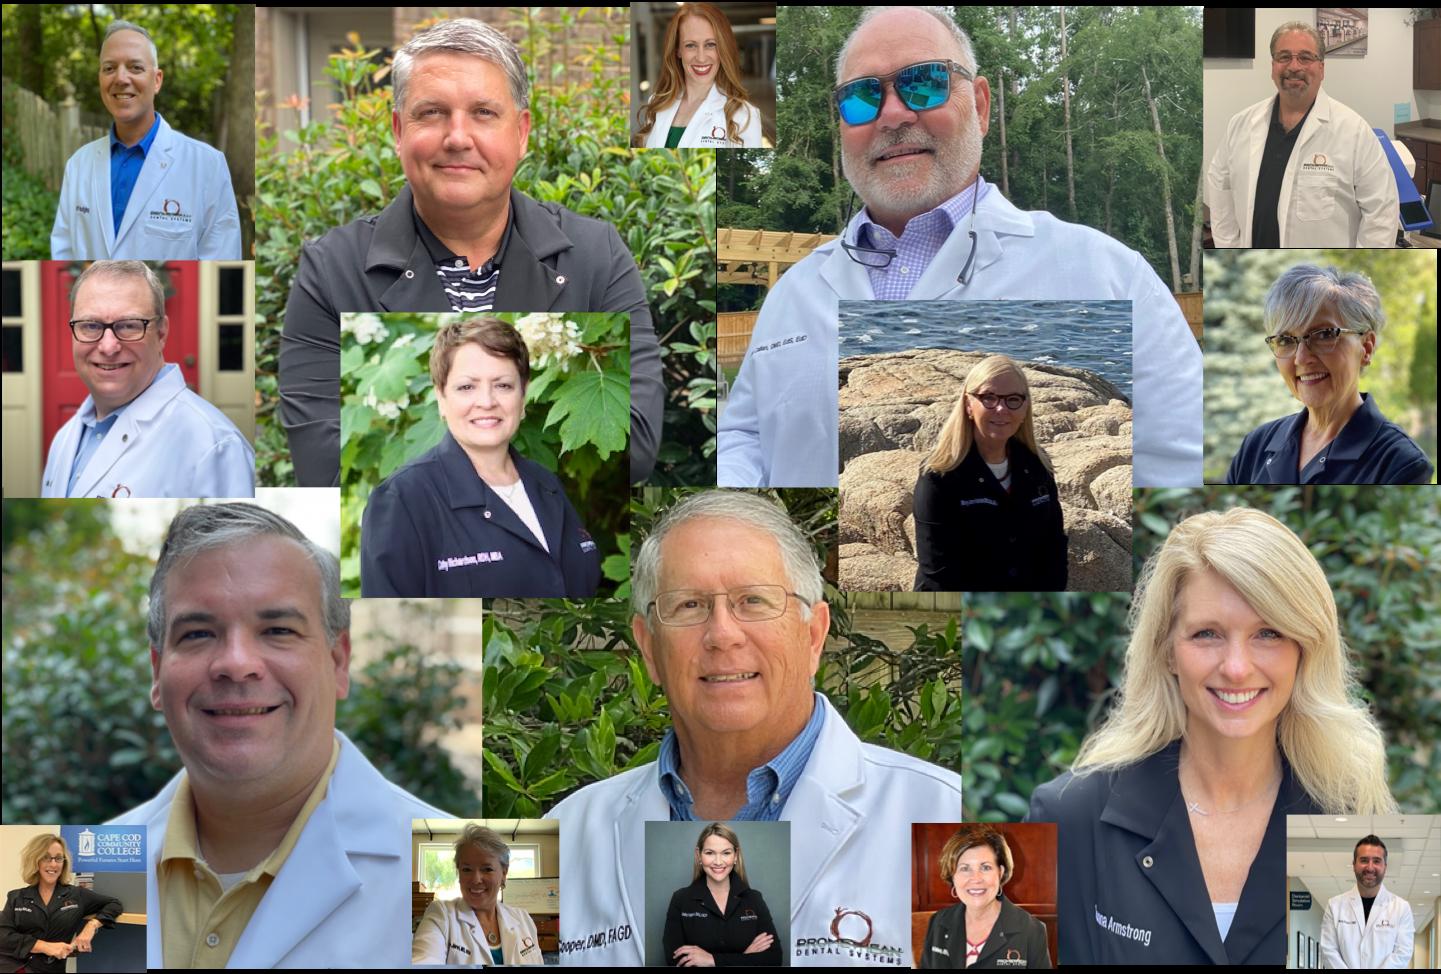 Promethean Dental Systems Team